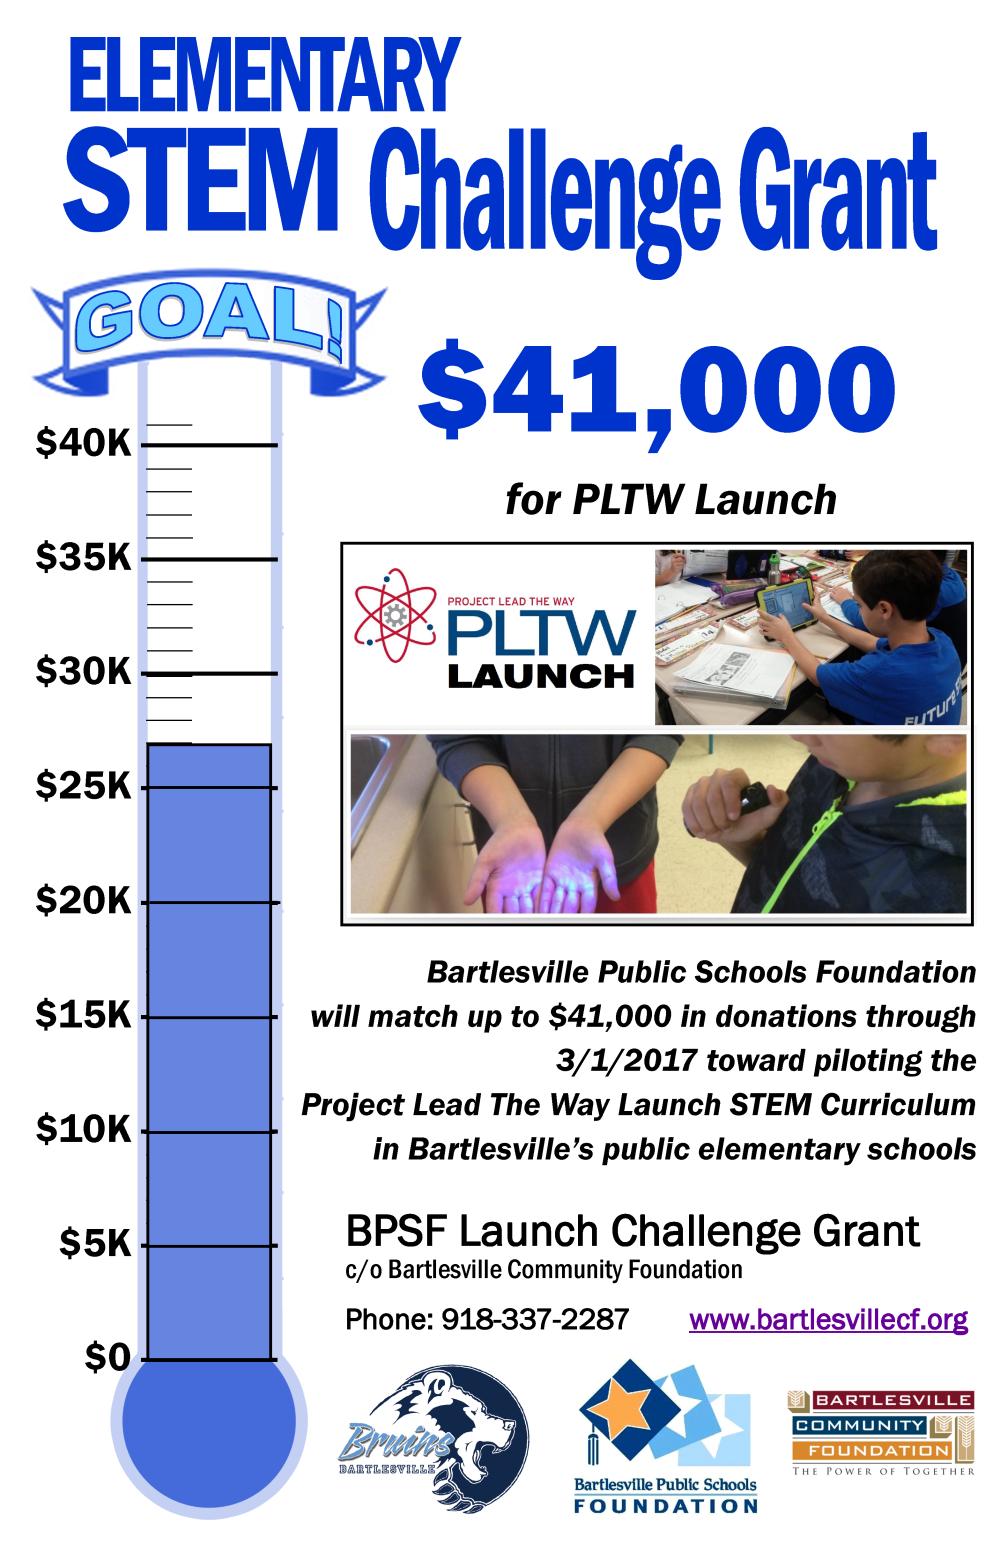 BPSF Challenge Grant